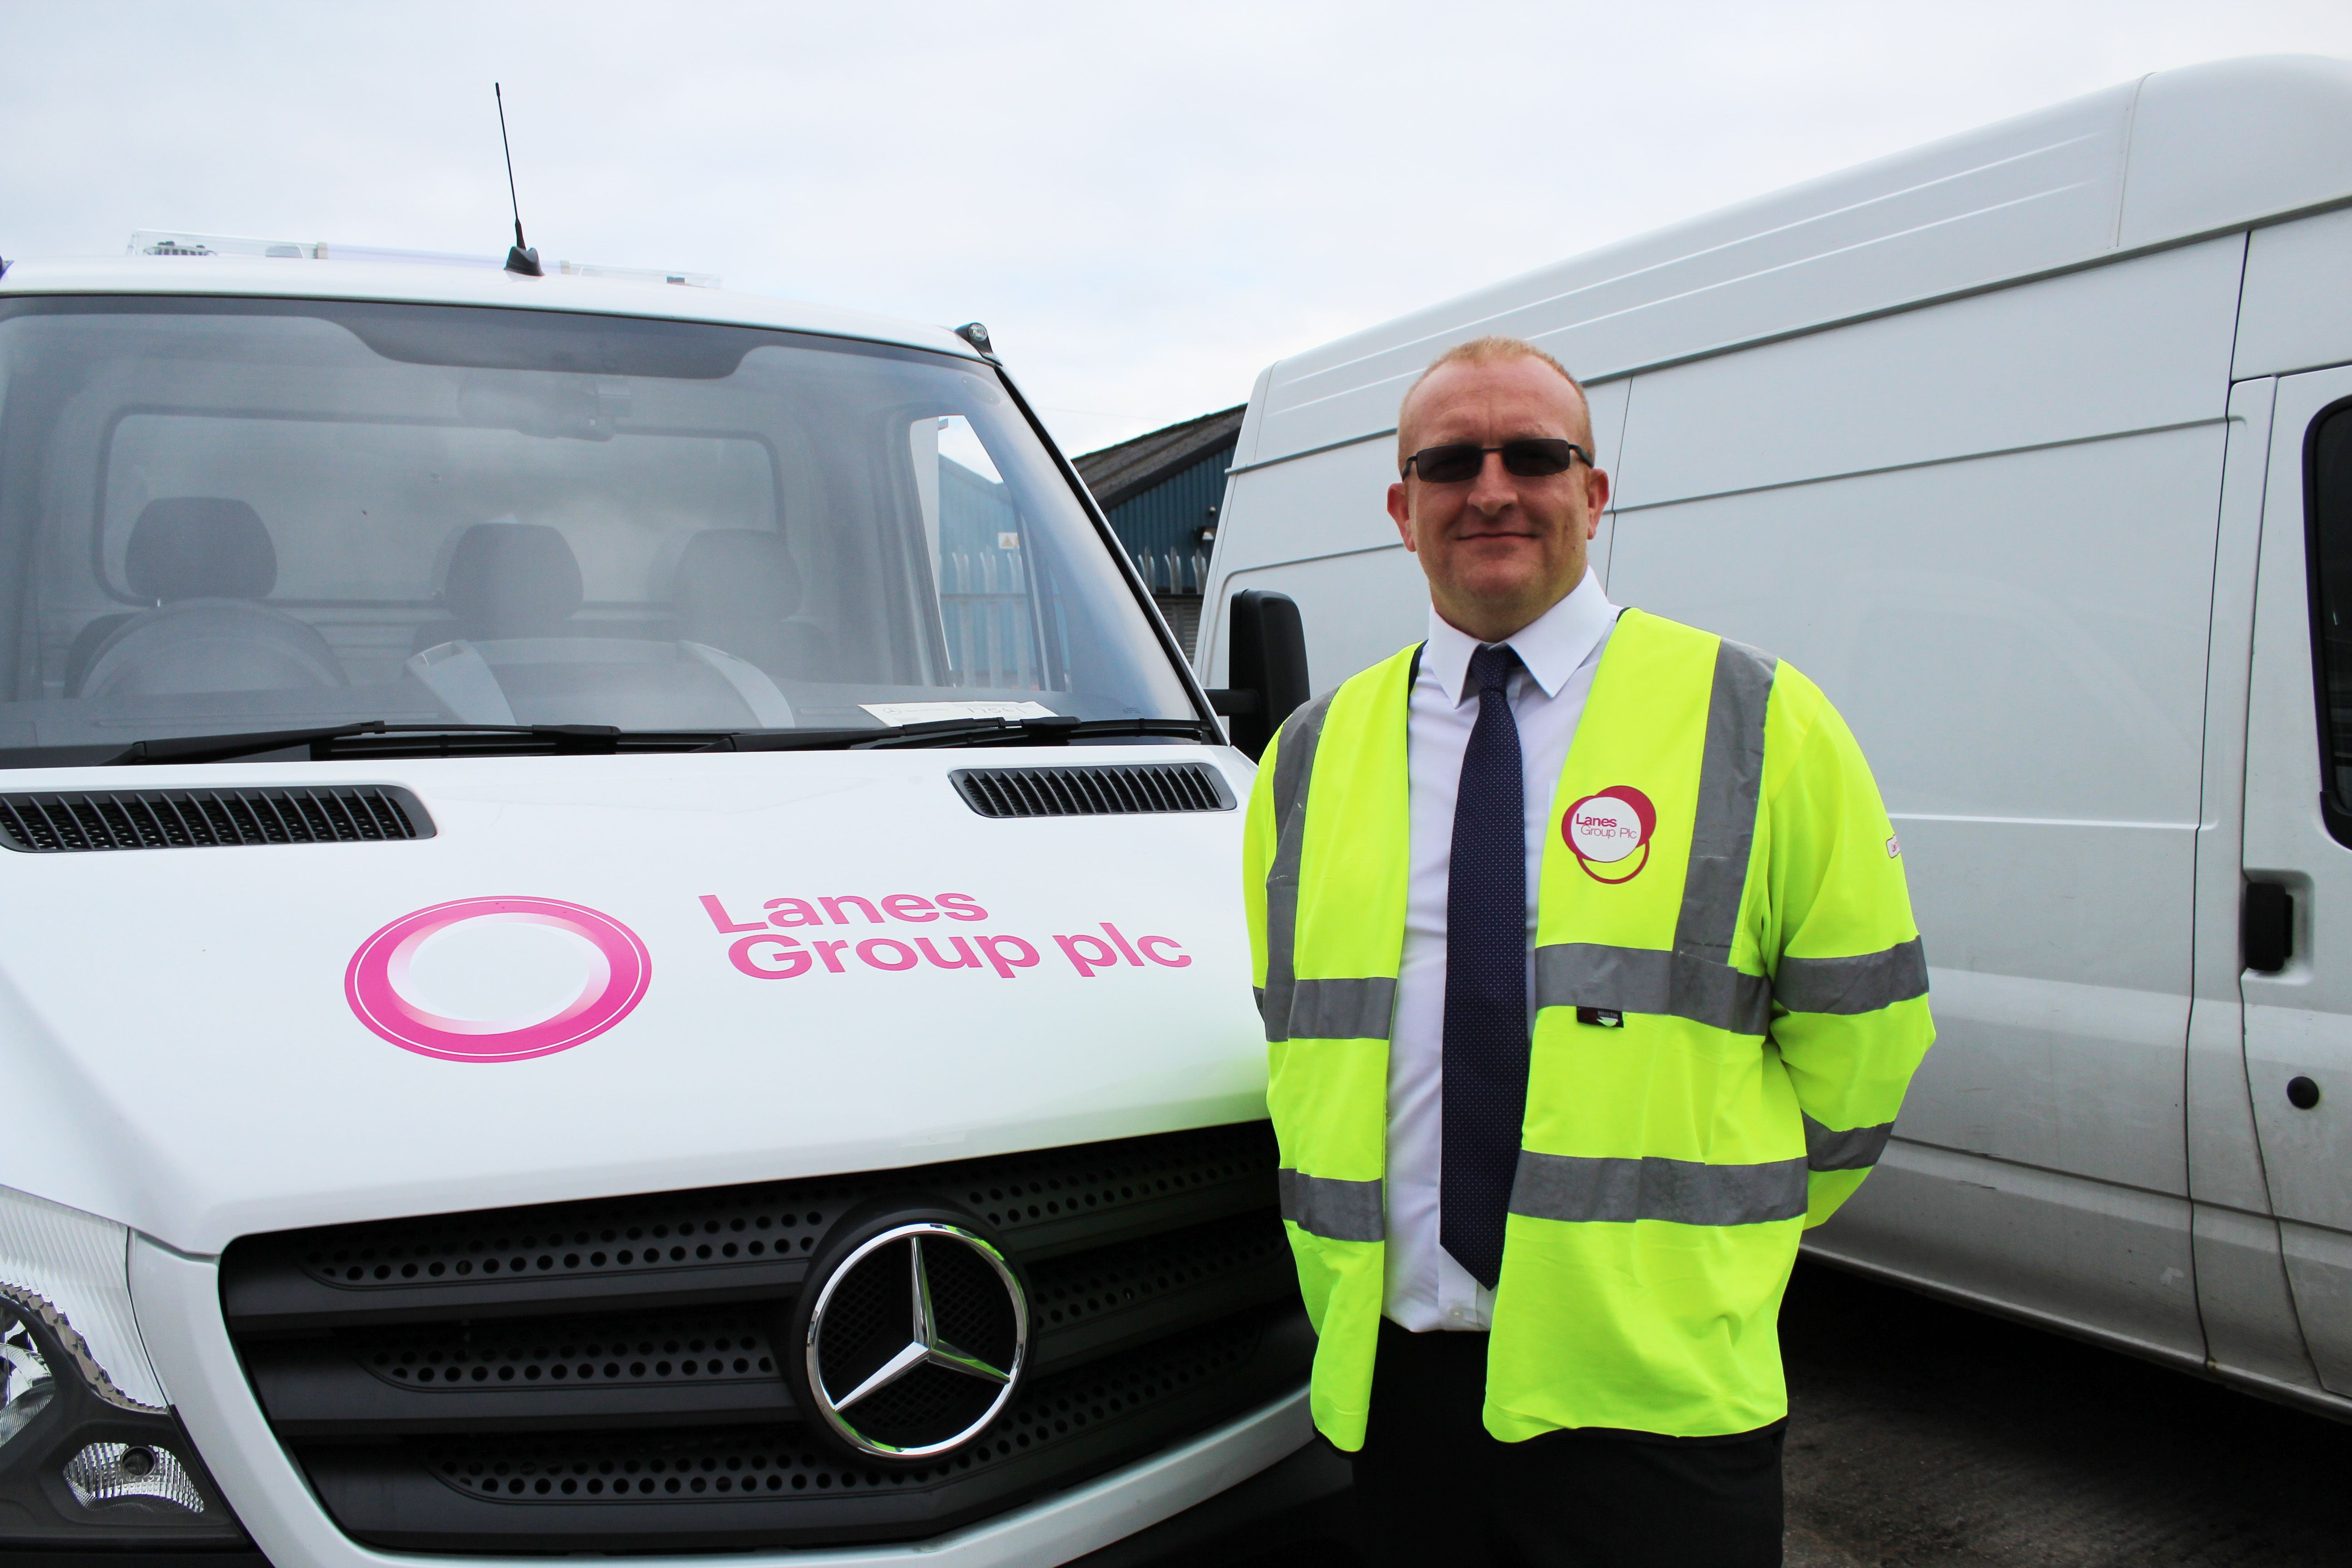 Chris Wilde standing in front of a Lanes Group van